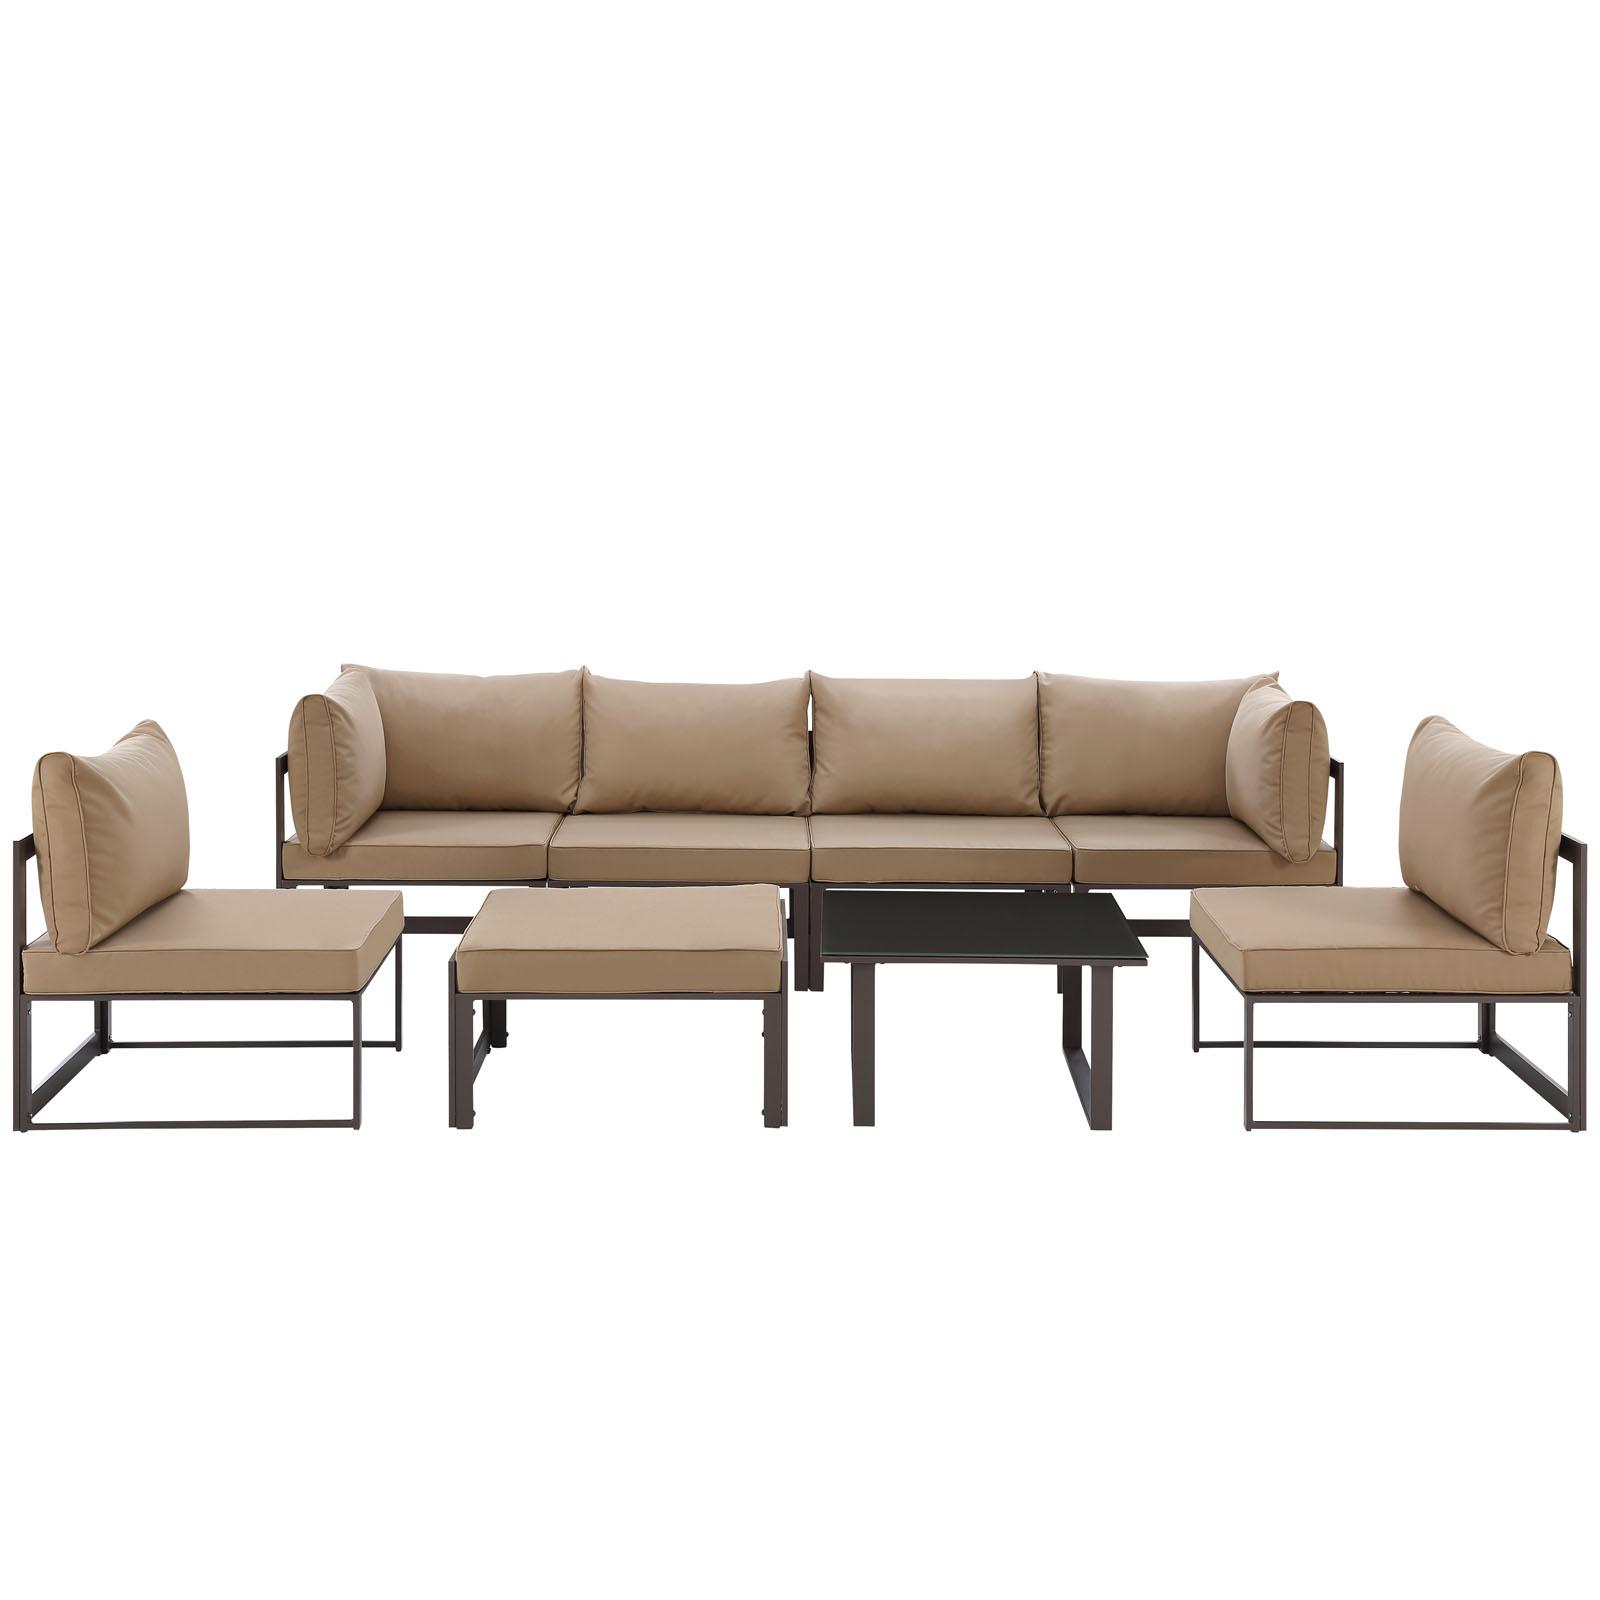 Lexmod Fortuna 8 Piece Outdoor Patio Sectional Sofa Set by OJ